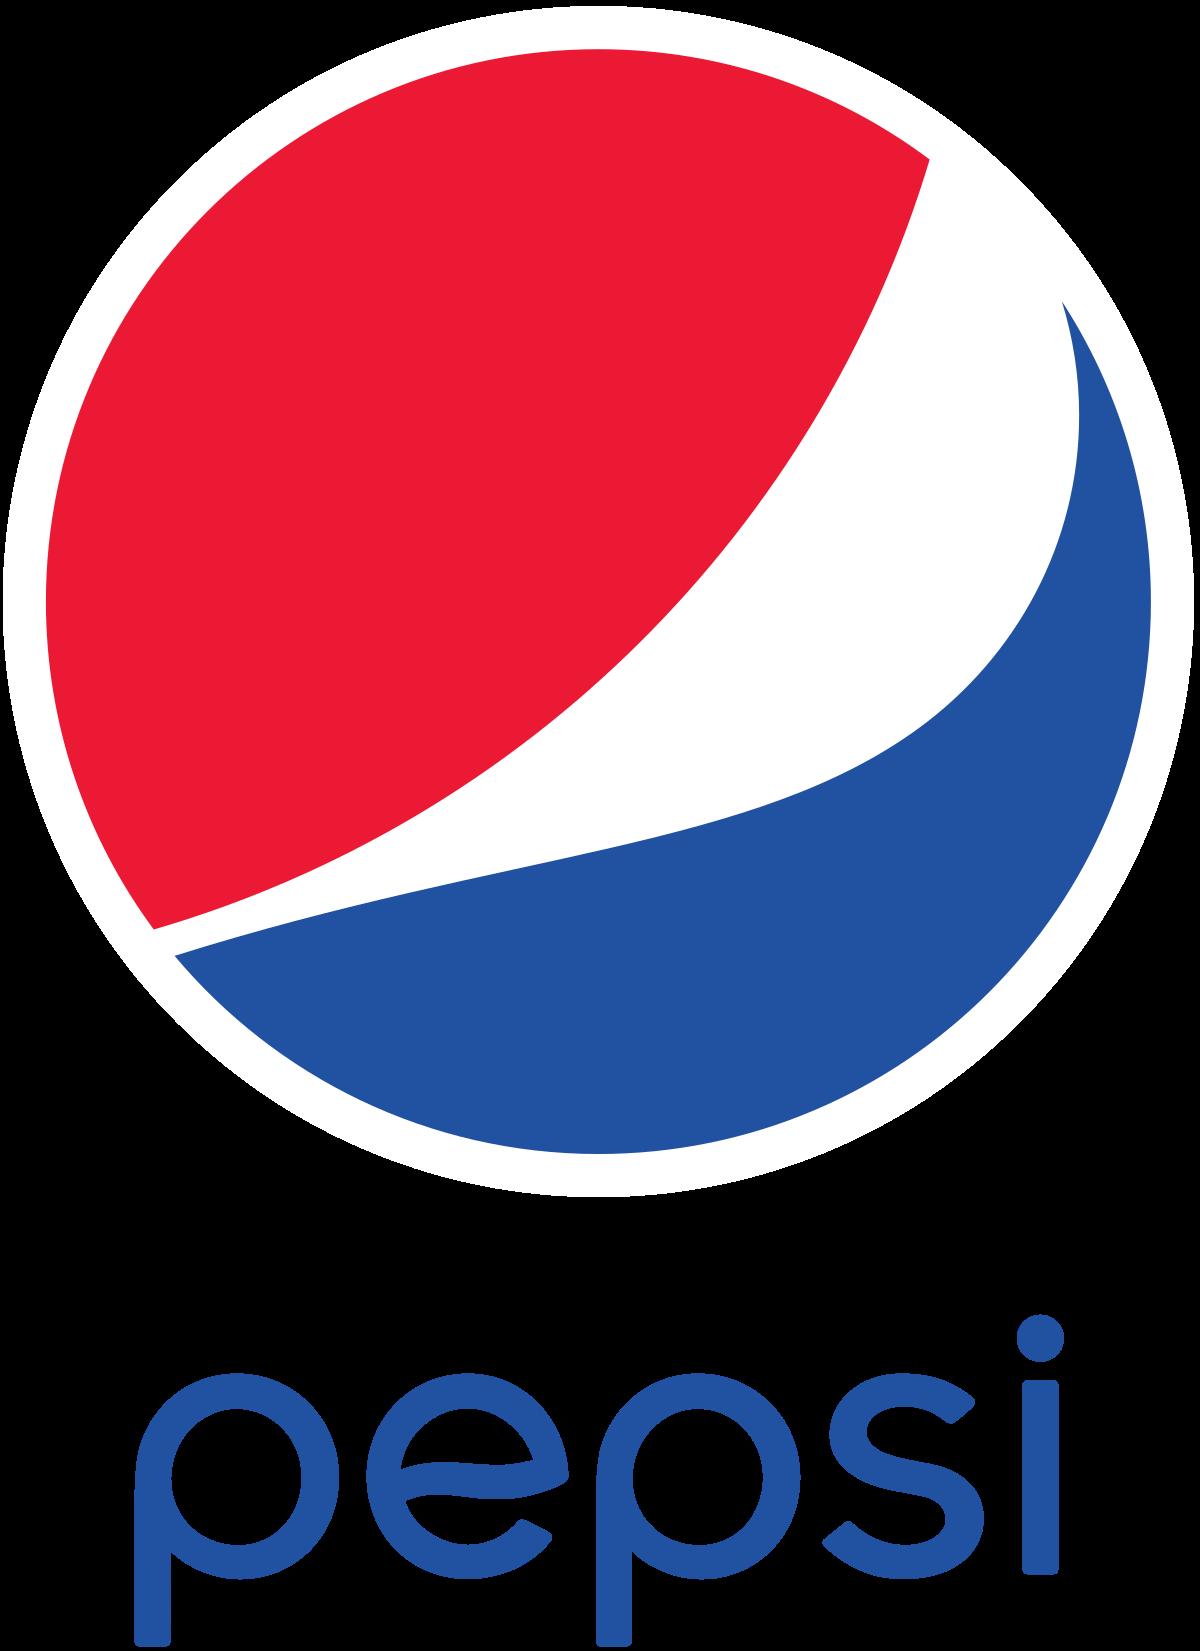 Pepsi Super Bowl QR Code